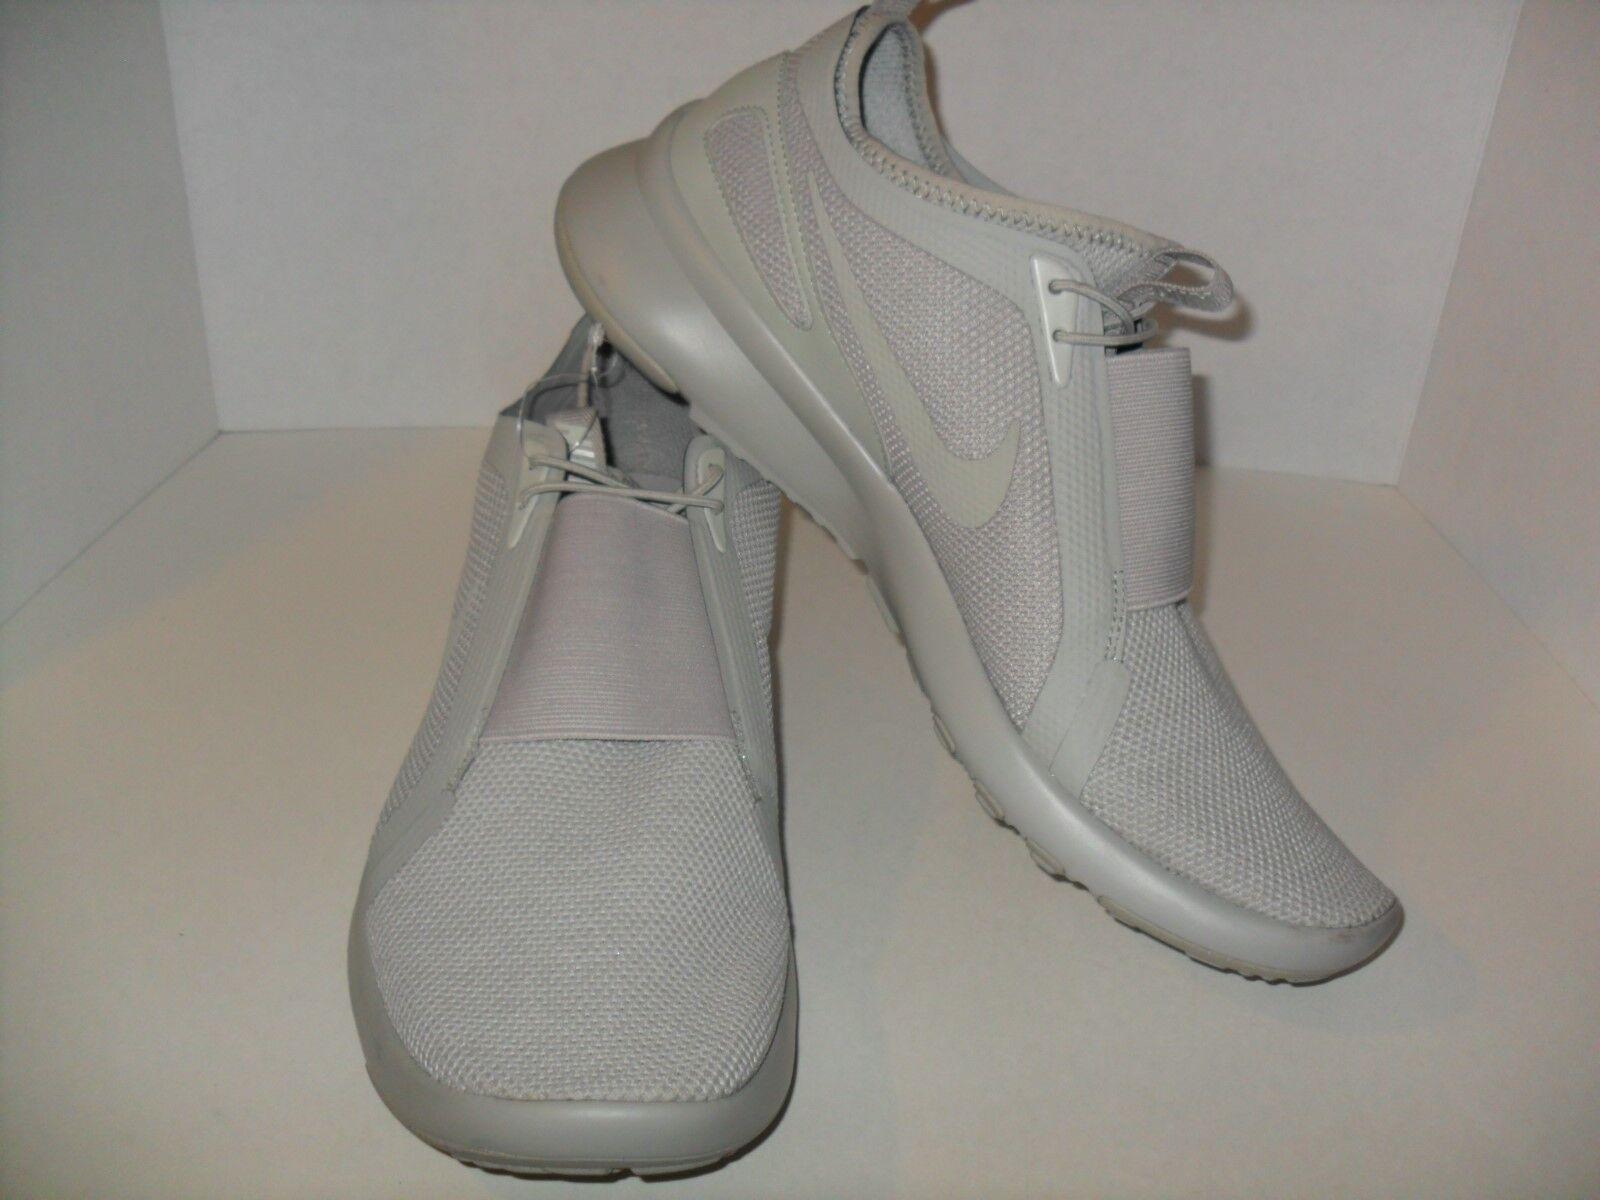 Nike Current Slip On BR Grey 903895-002 - Breathe Dart Presto Flyknit Tech Sock Wild casual shoes